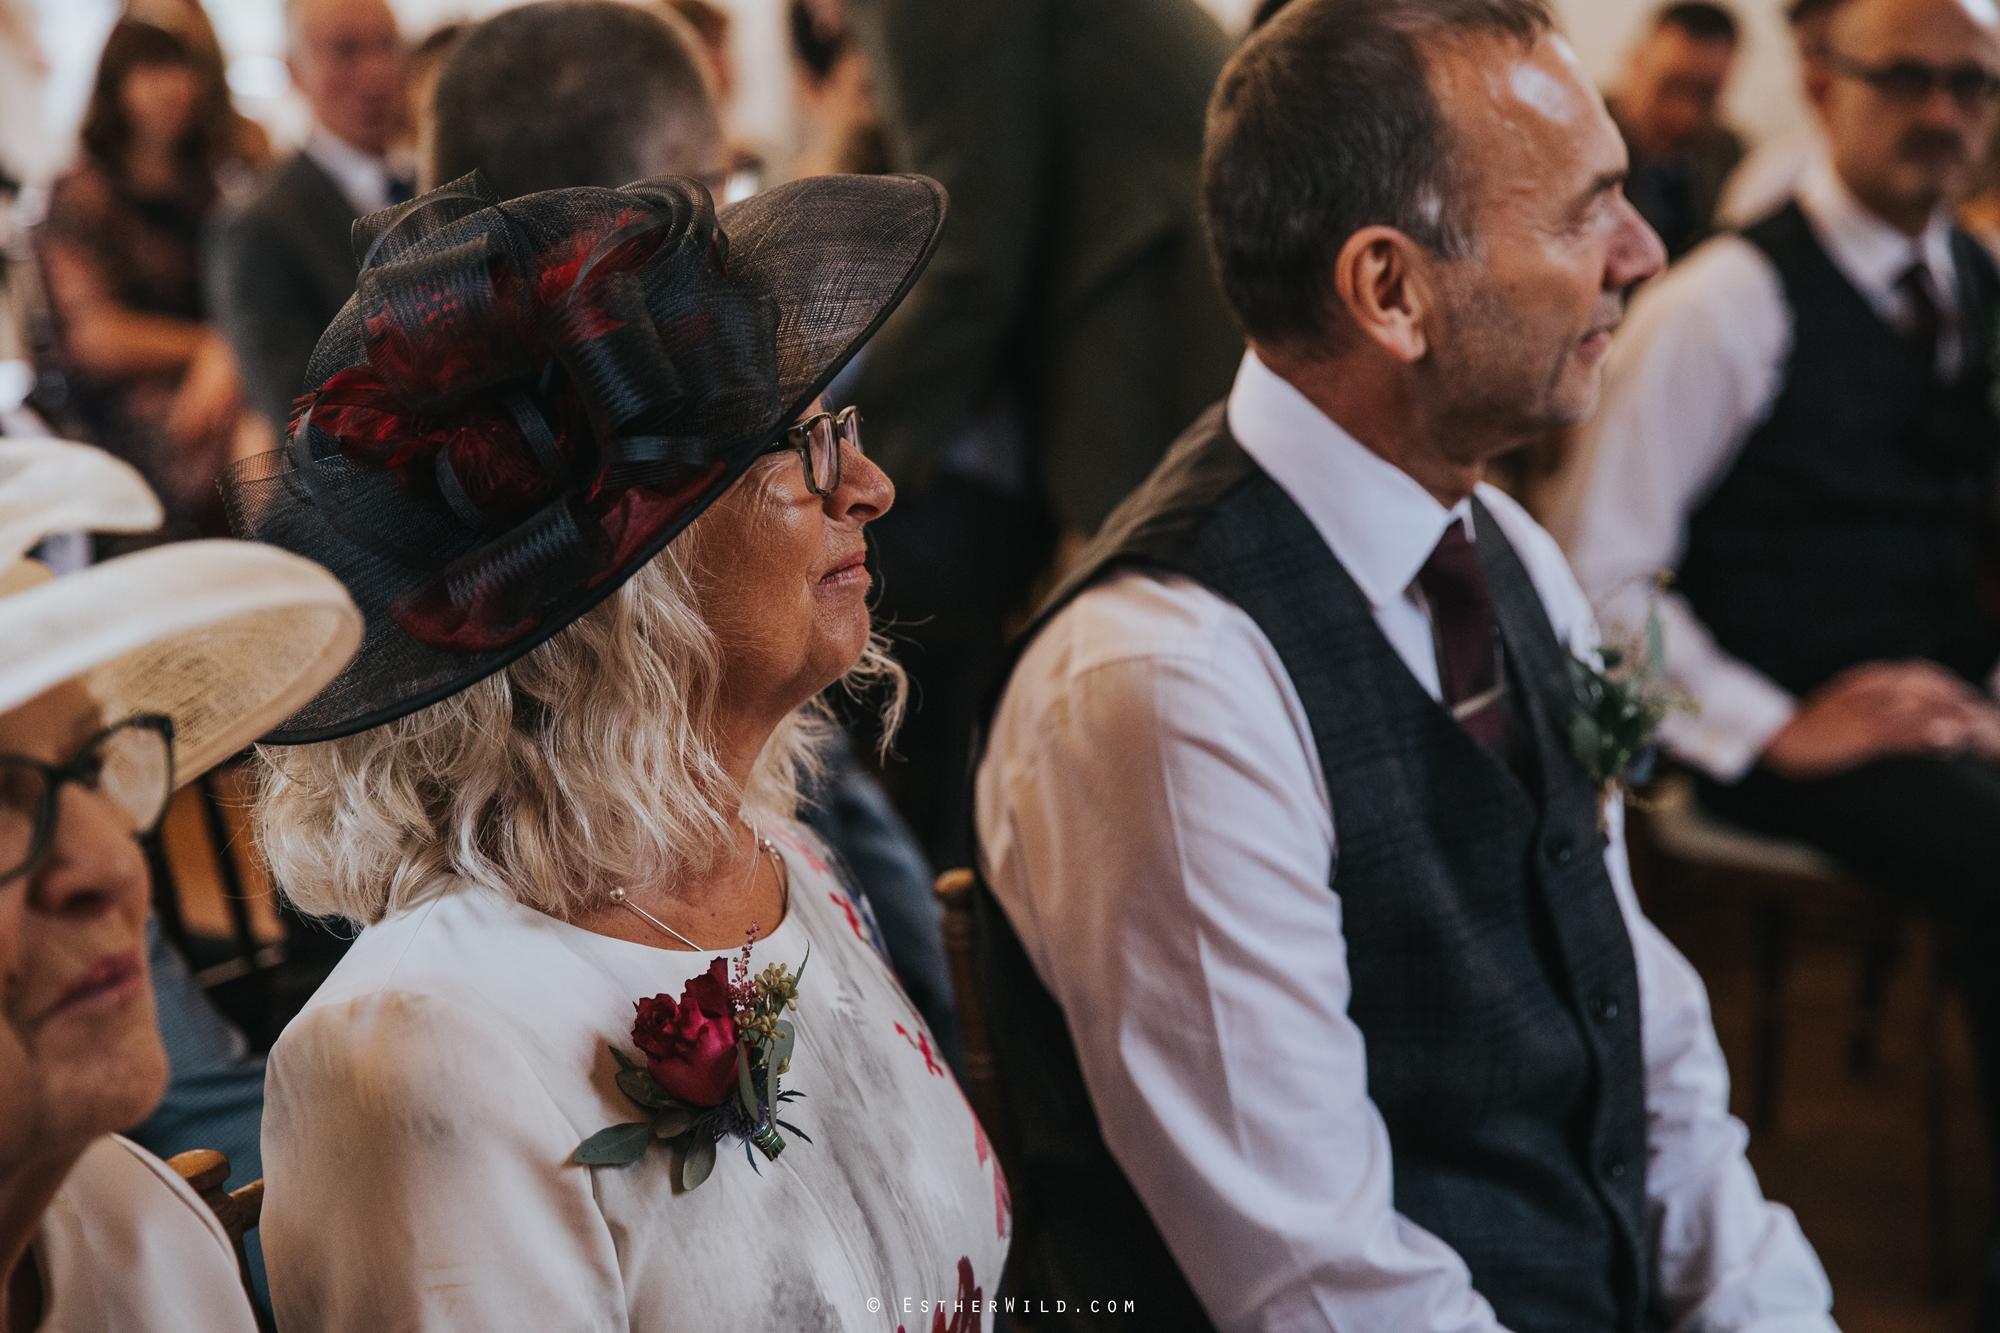 Reading_Room_Weddings_Alby_Norwich_Photographer_Esther_Wild_IMG_1008.jpg